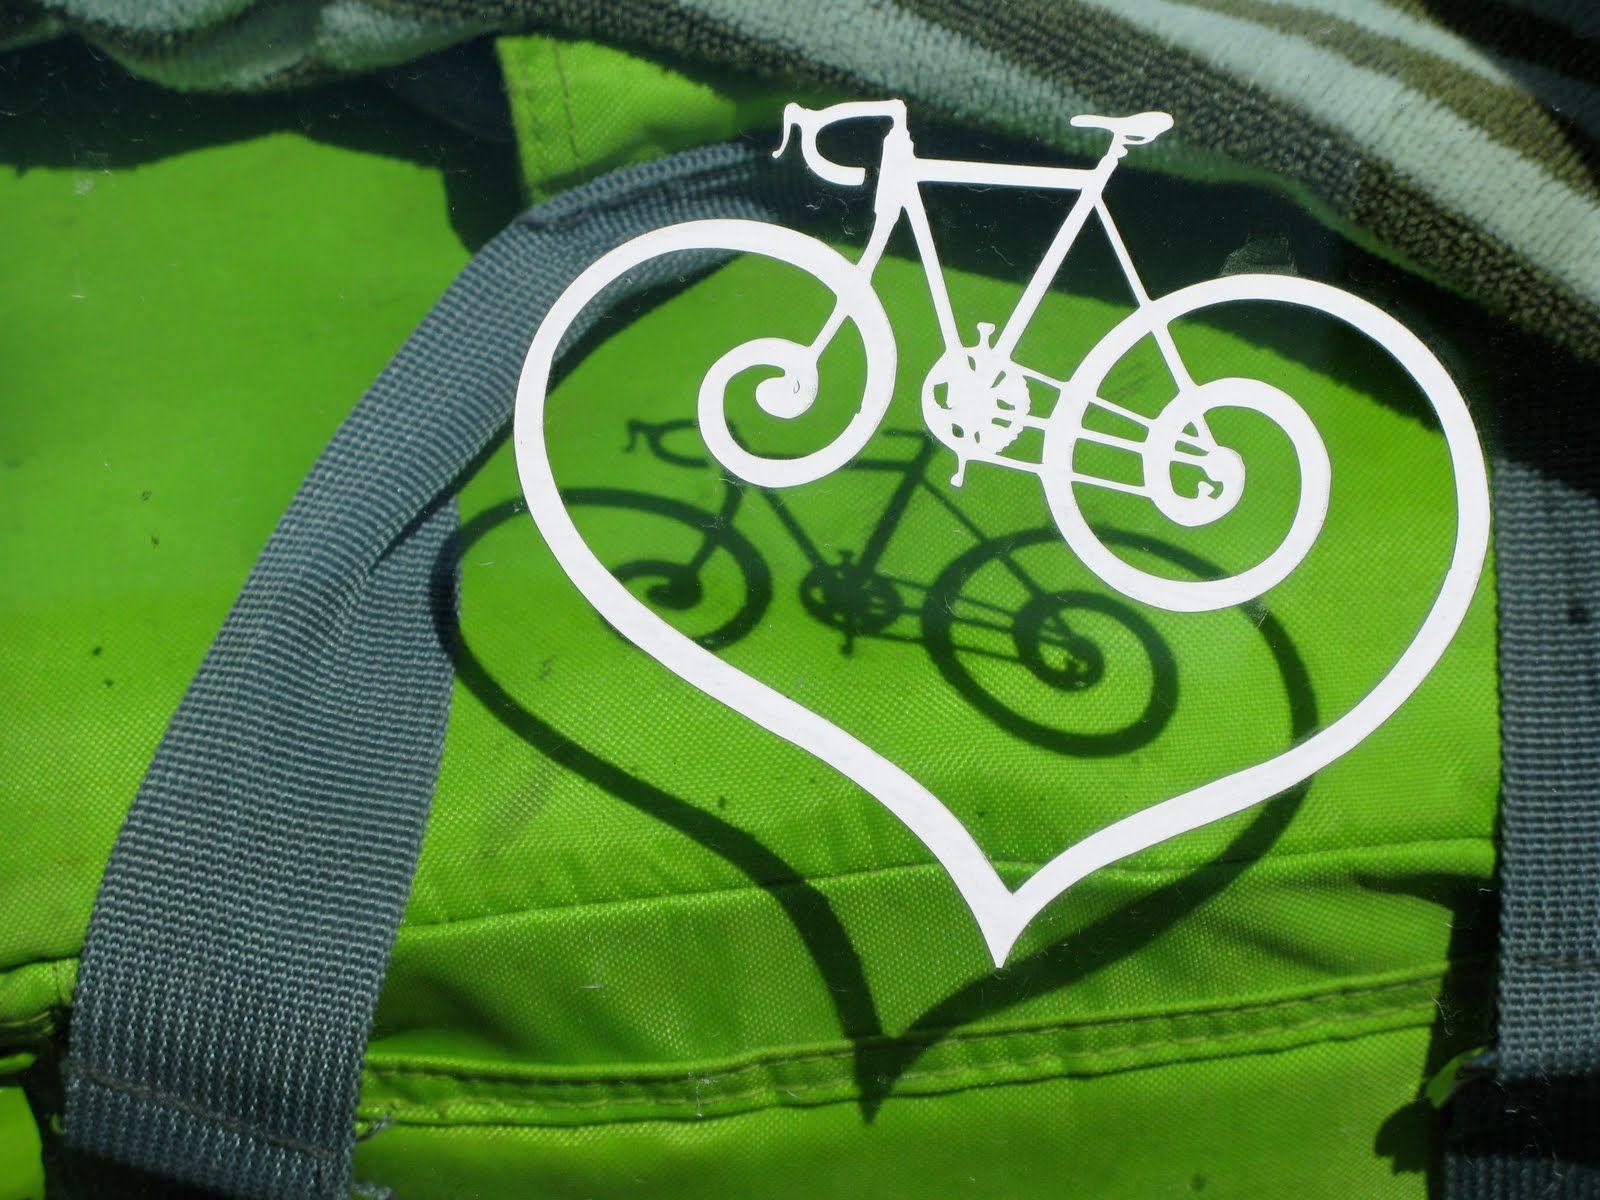 Cool sticker design for bike - Cool Sticker Seen At Bike Bliss Bike Love A Glimpse